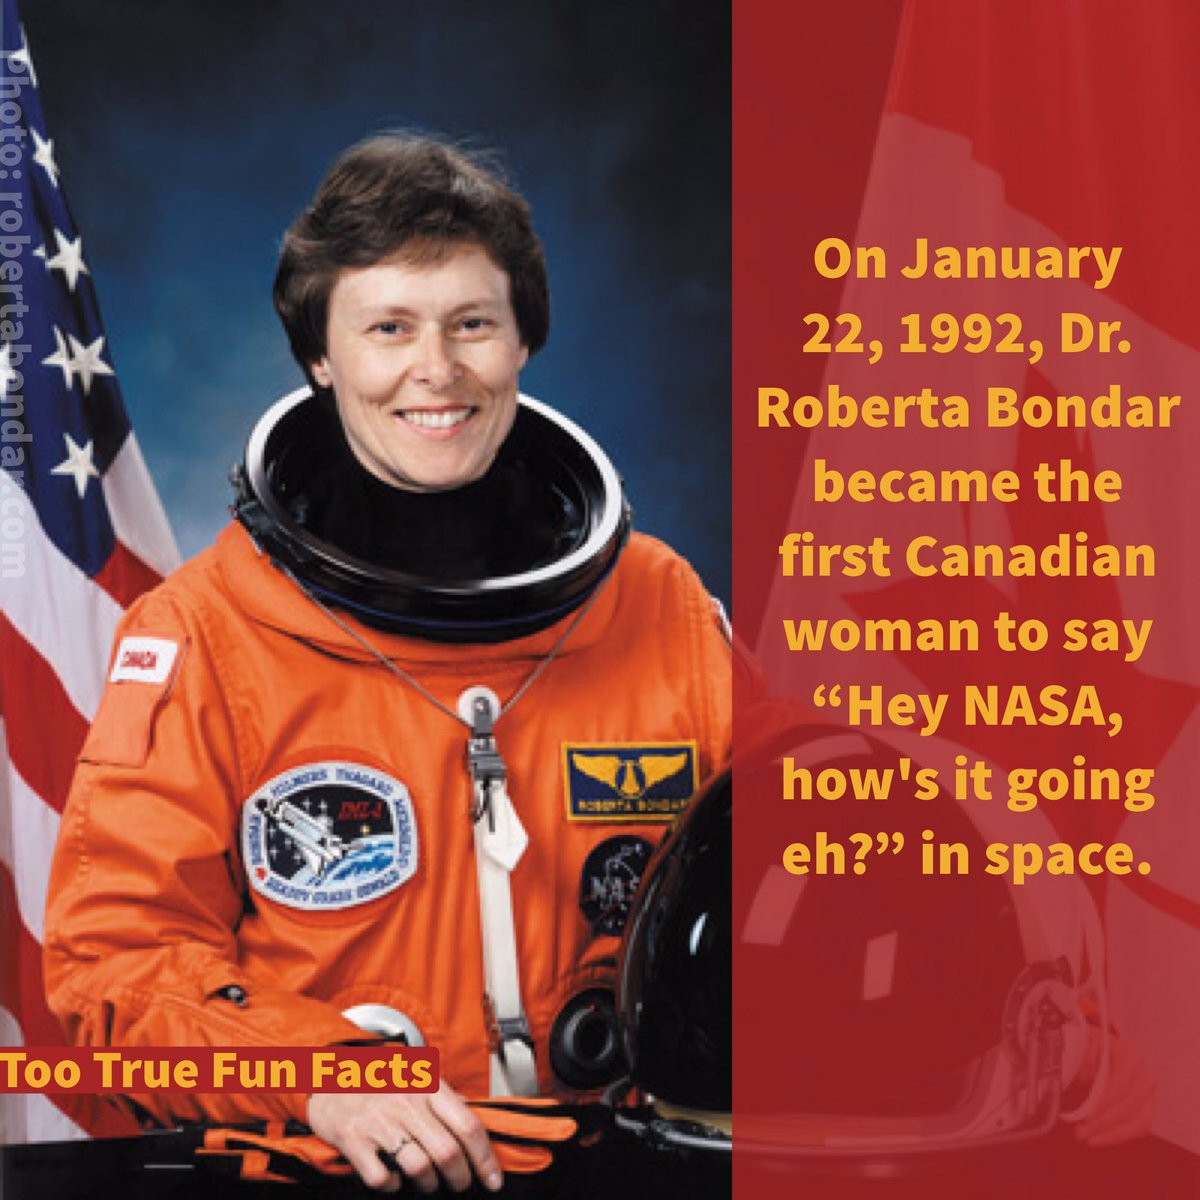 Cabada150 Science Funfacts. #astronauts #NASA #Science #sciencerocks #sciencesunday #canada #canadian #comedy #funny #oarody #satire #lol<br>http://pic.twitter.com/ZAhu2Bj1cC